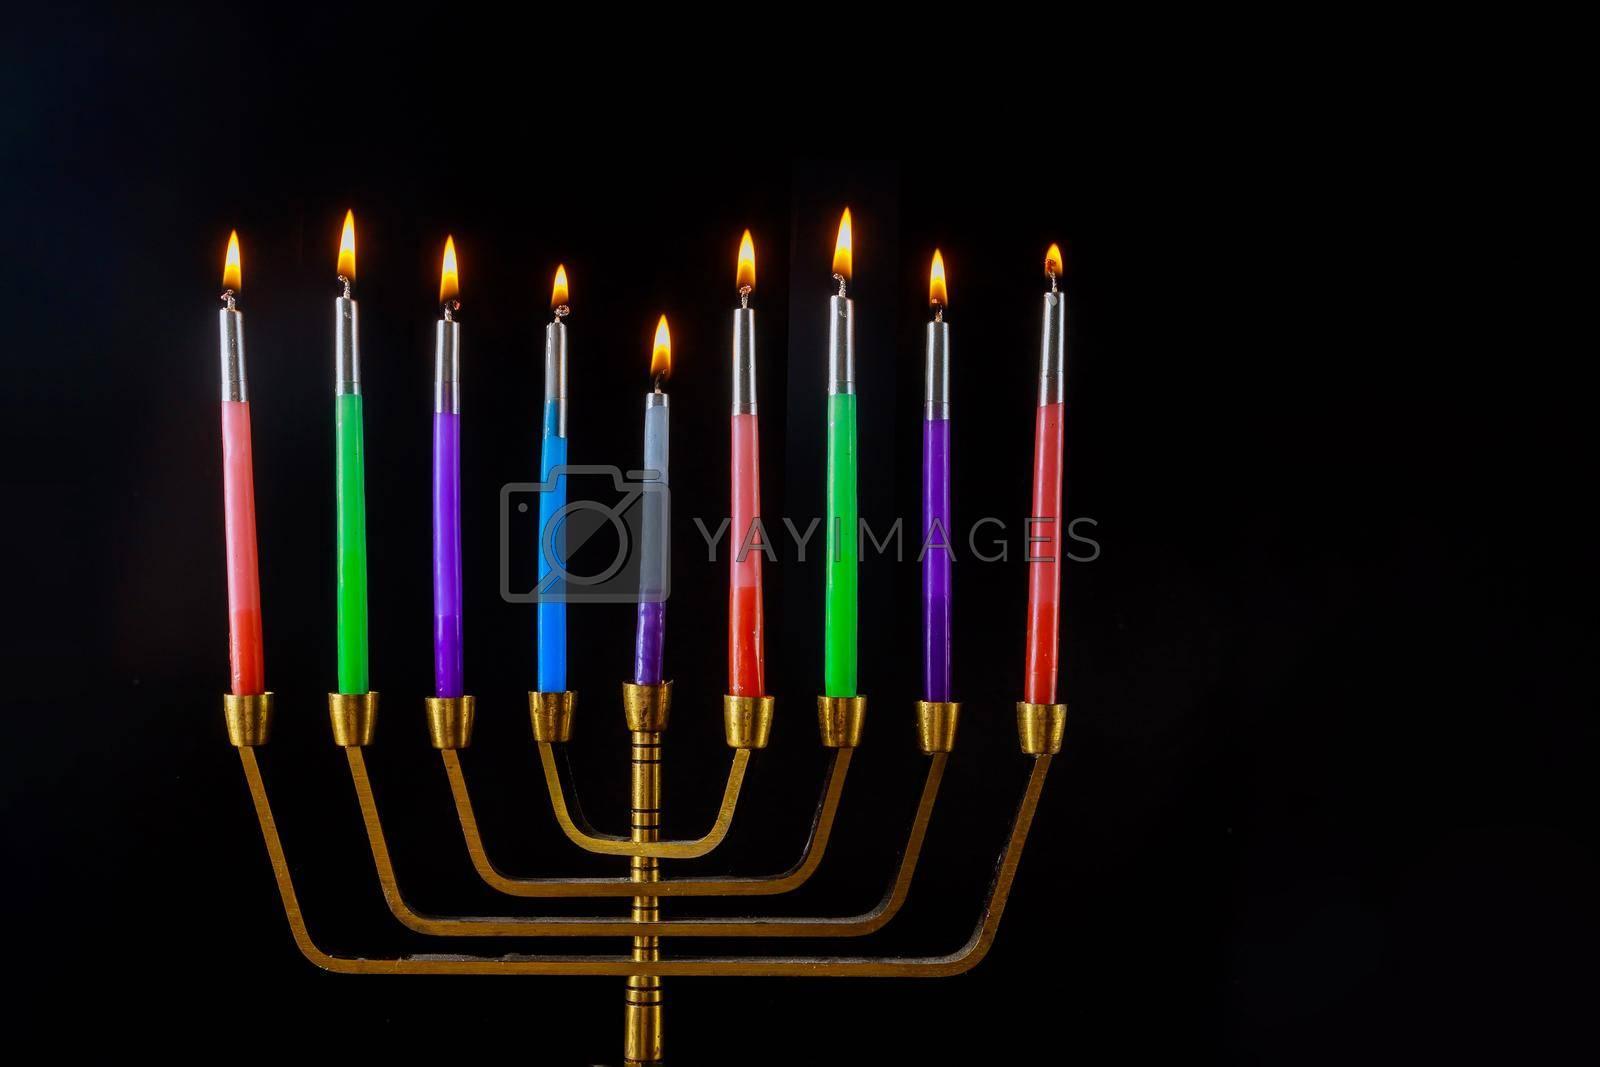 Jewish religion holiday Hanukkah on of Chanukiah menorah in nine candles